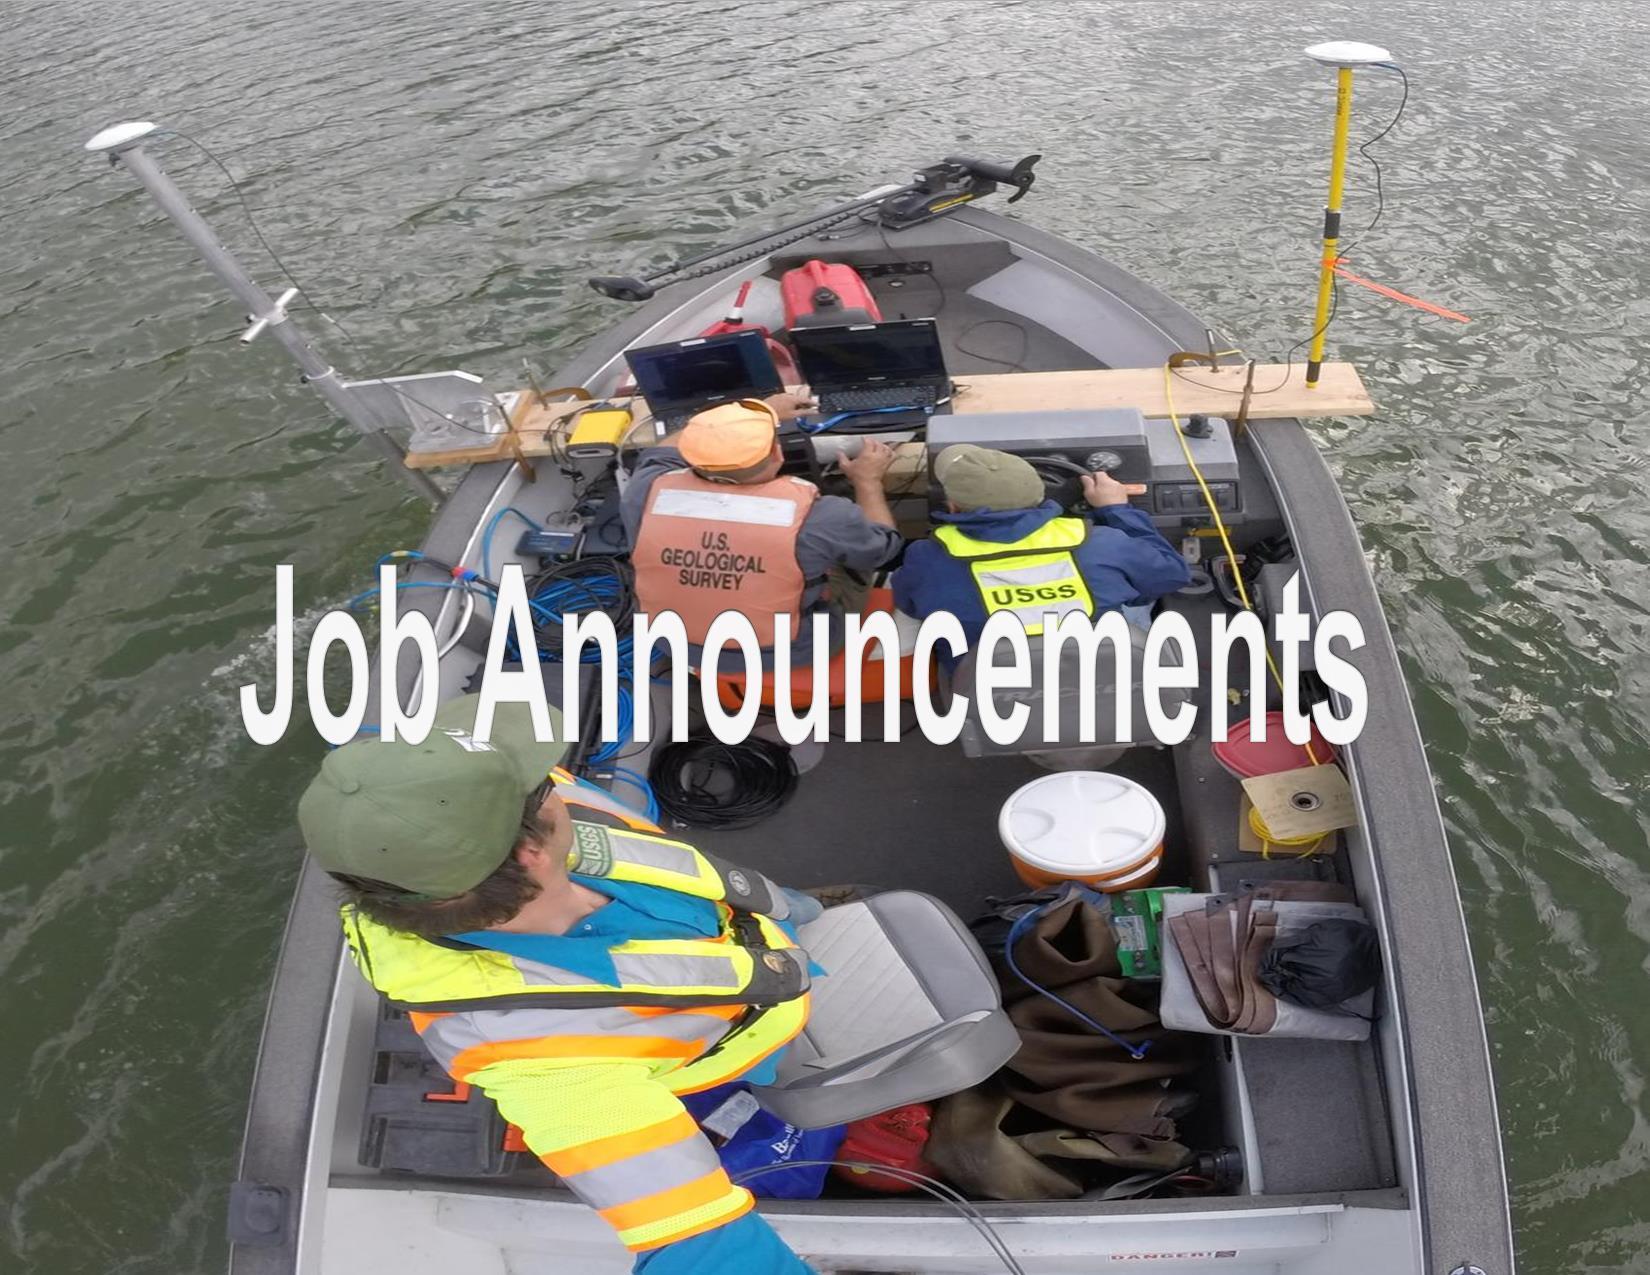 Michael Kohn, USGS Colorado Water Science Center, USGS research vessel, June 8, 2016